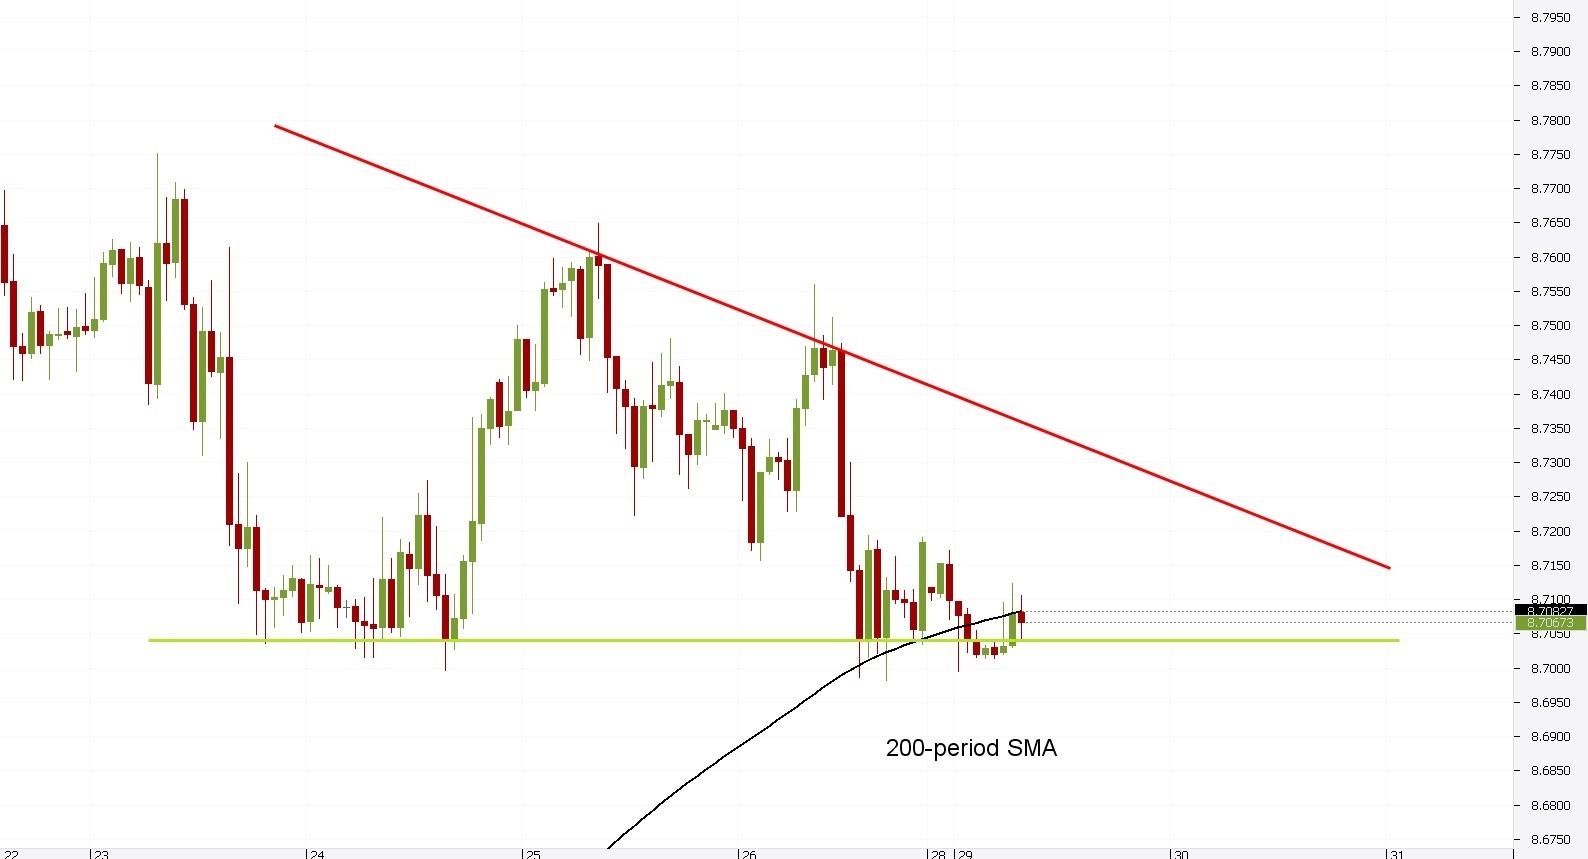 EUR/HKD 1H Chart: Descending Triangle